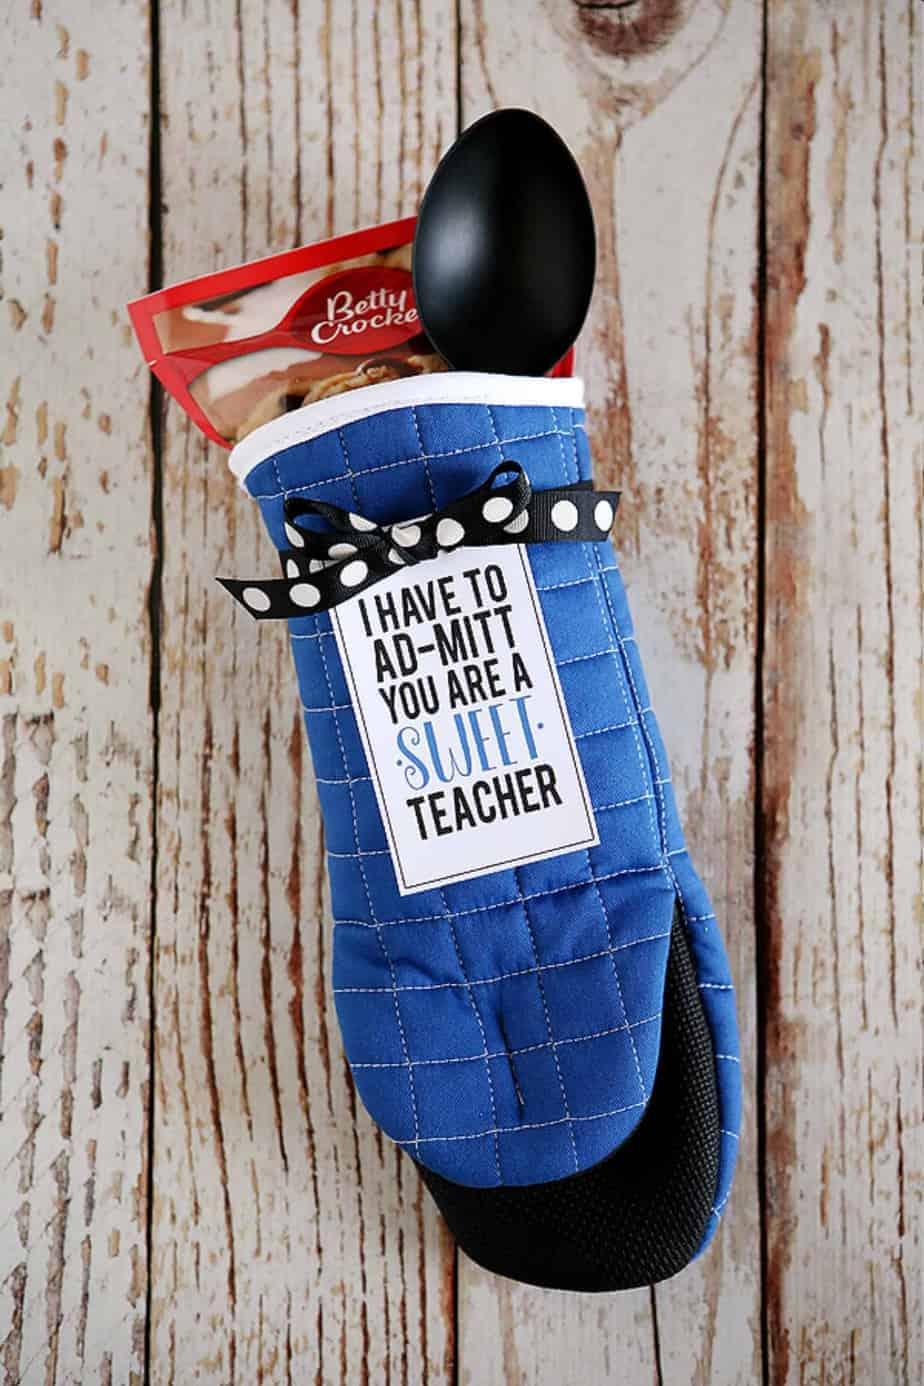 Oven mitt treat teacher gifts